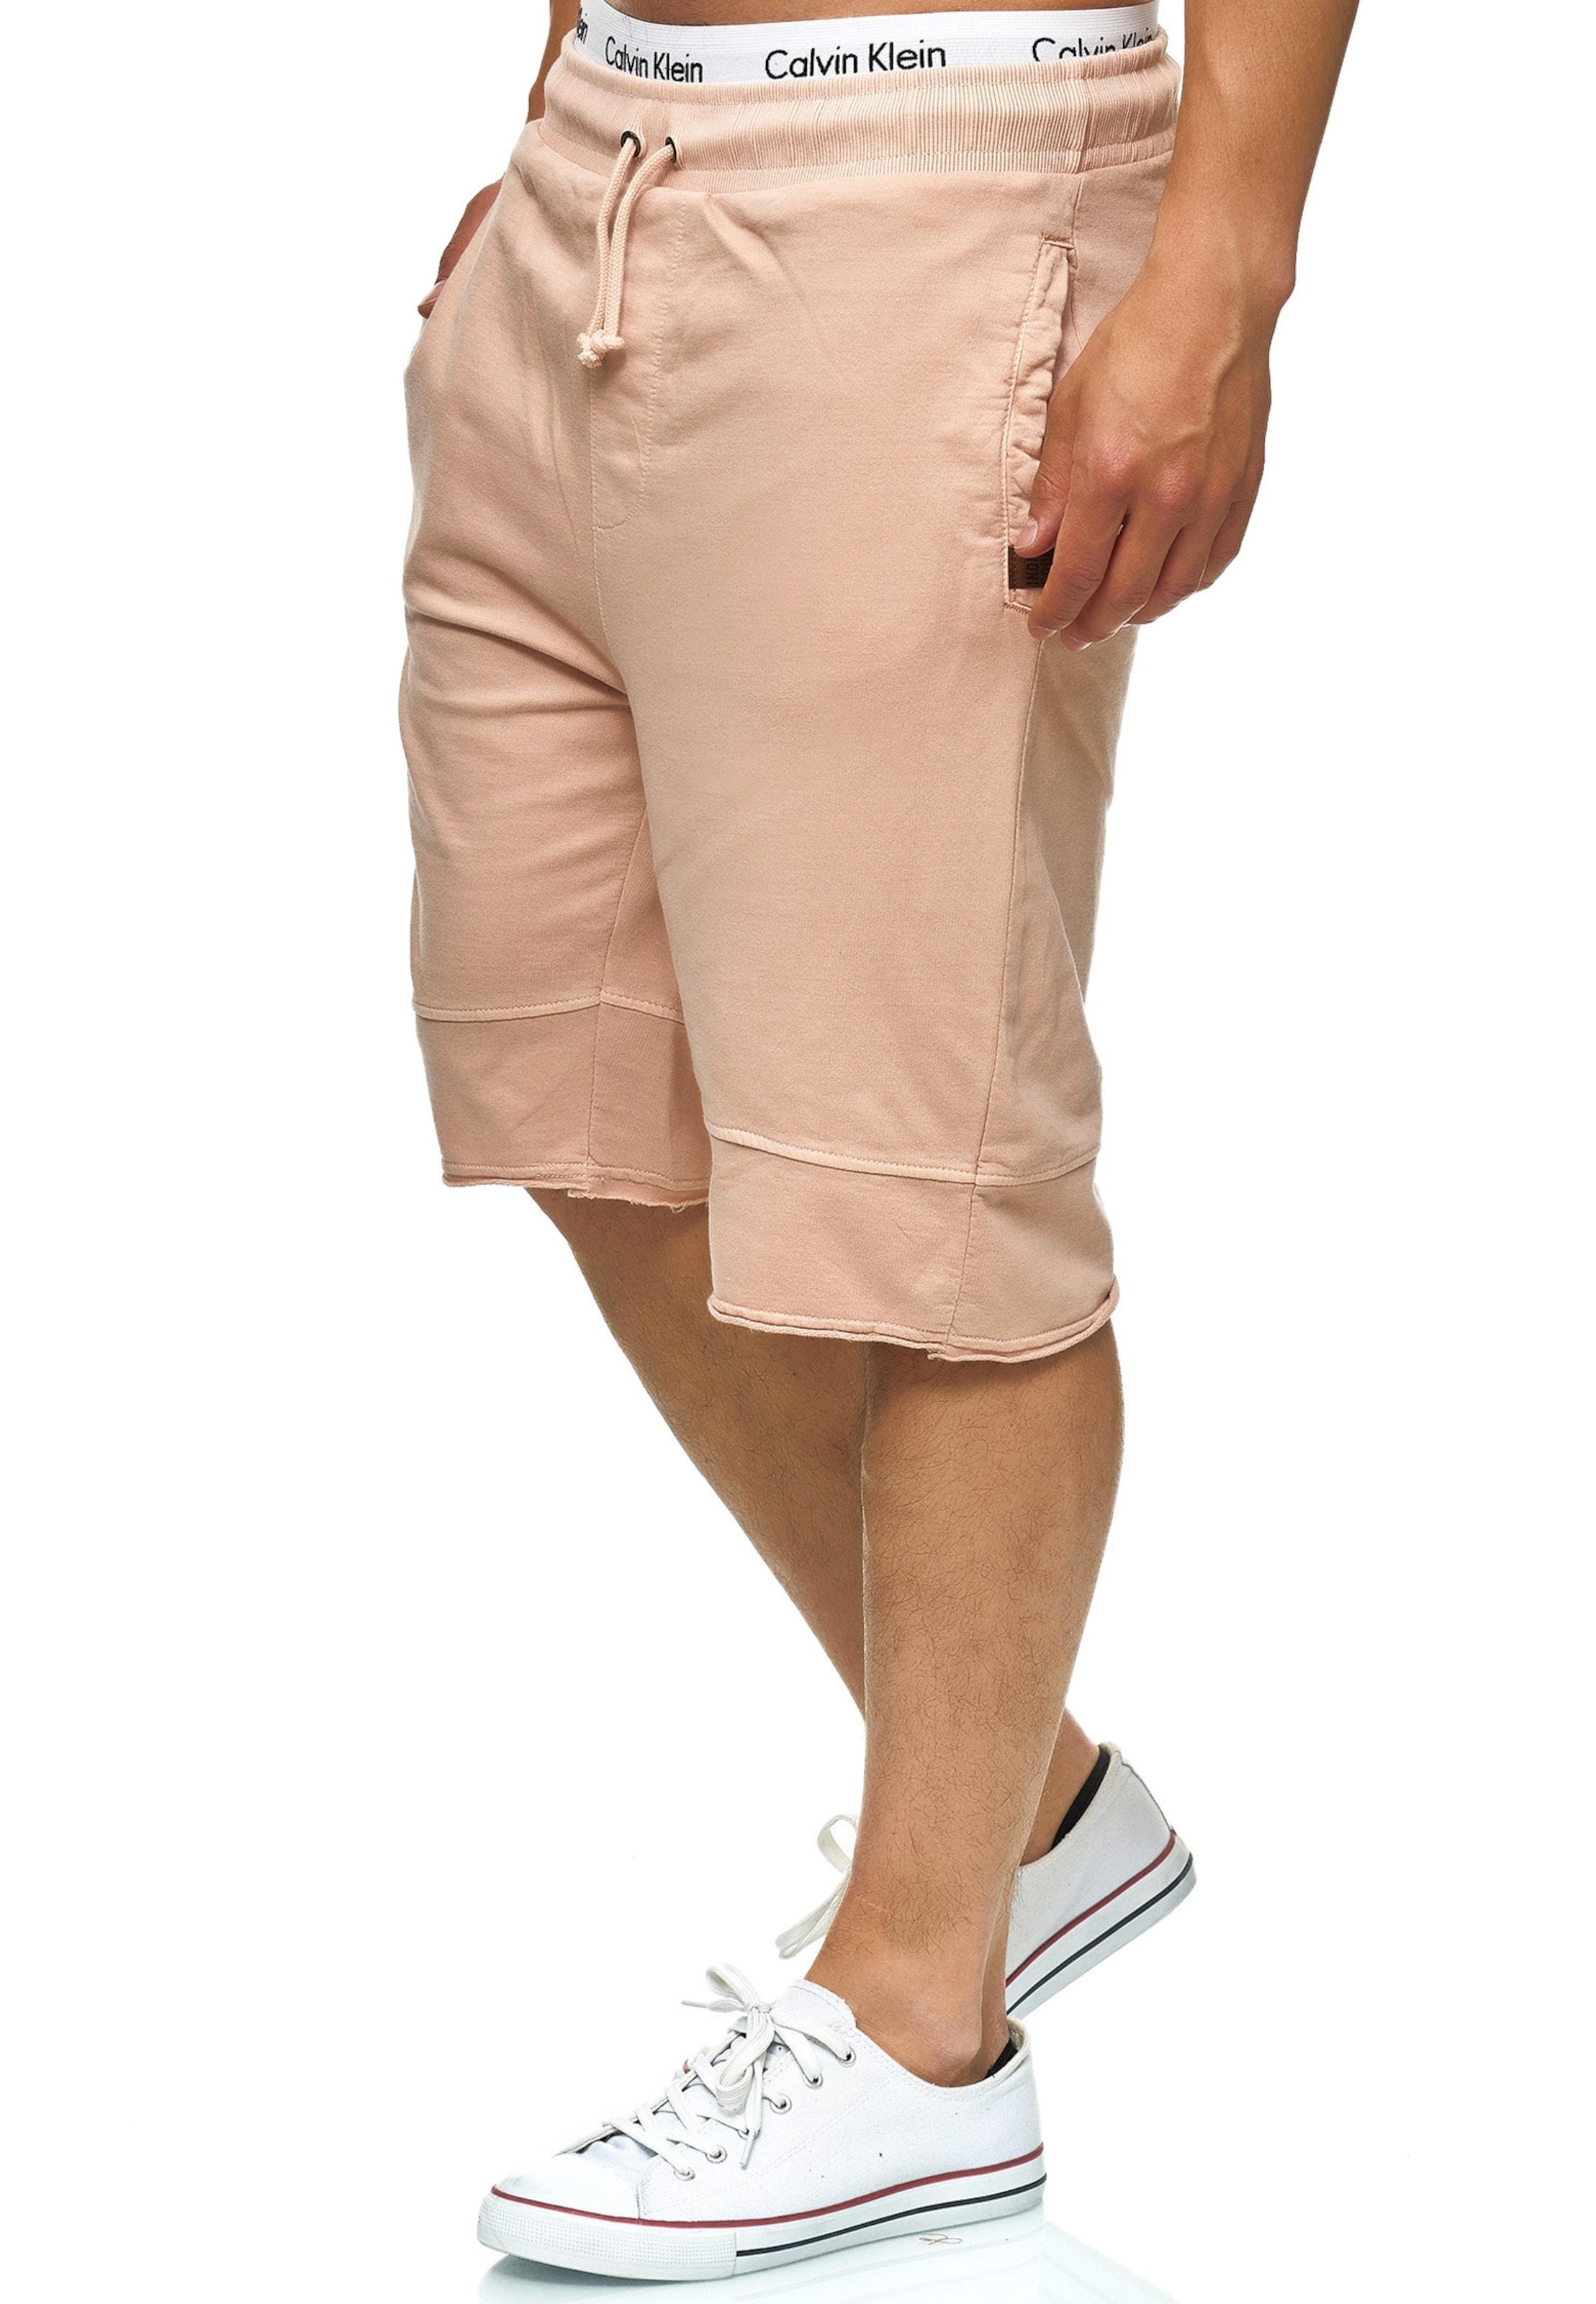 Rose 'elgood Indicode Pantalon ' En Ancienne Jeans QCrxBthds